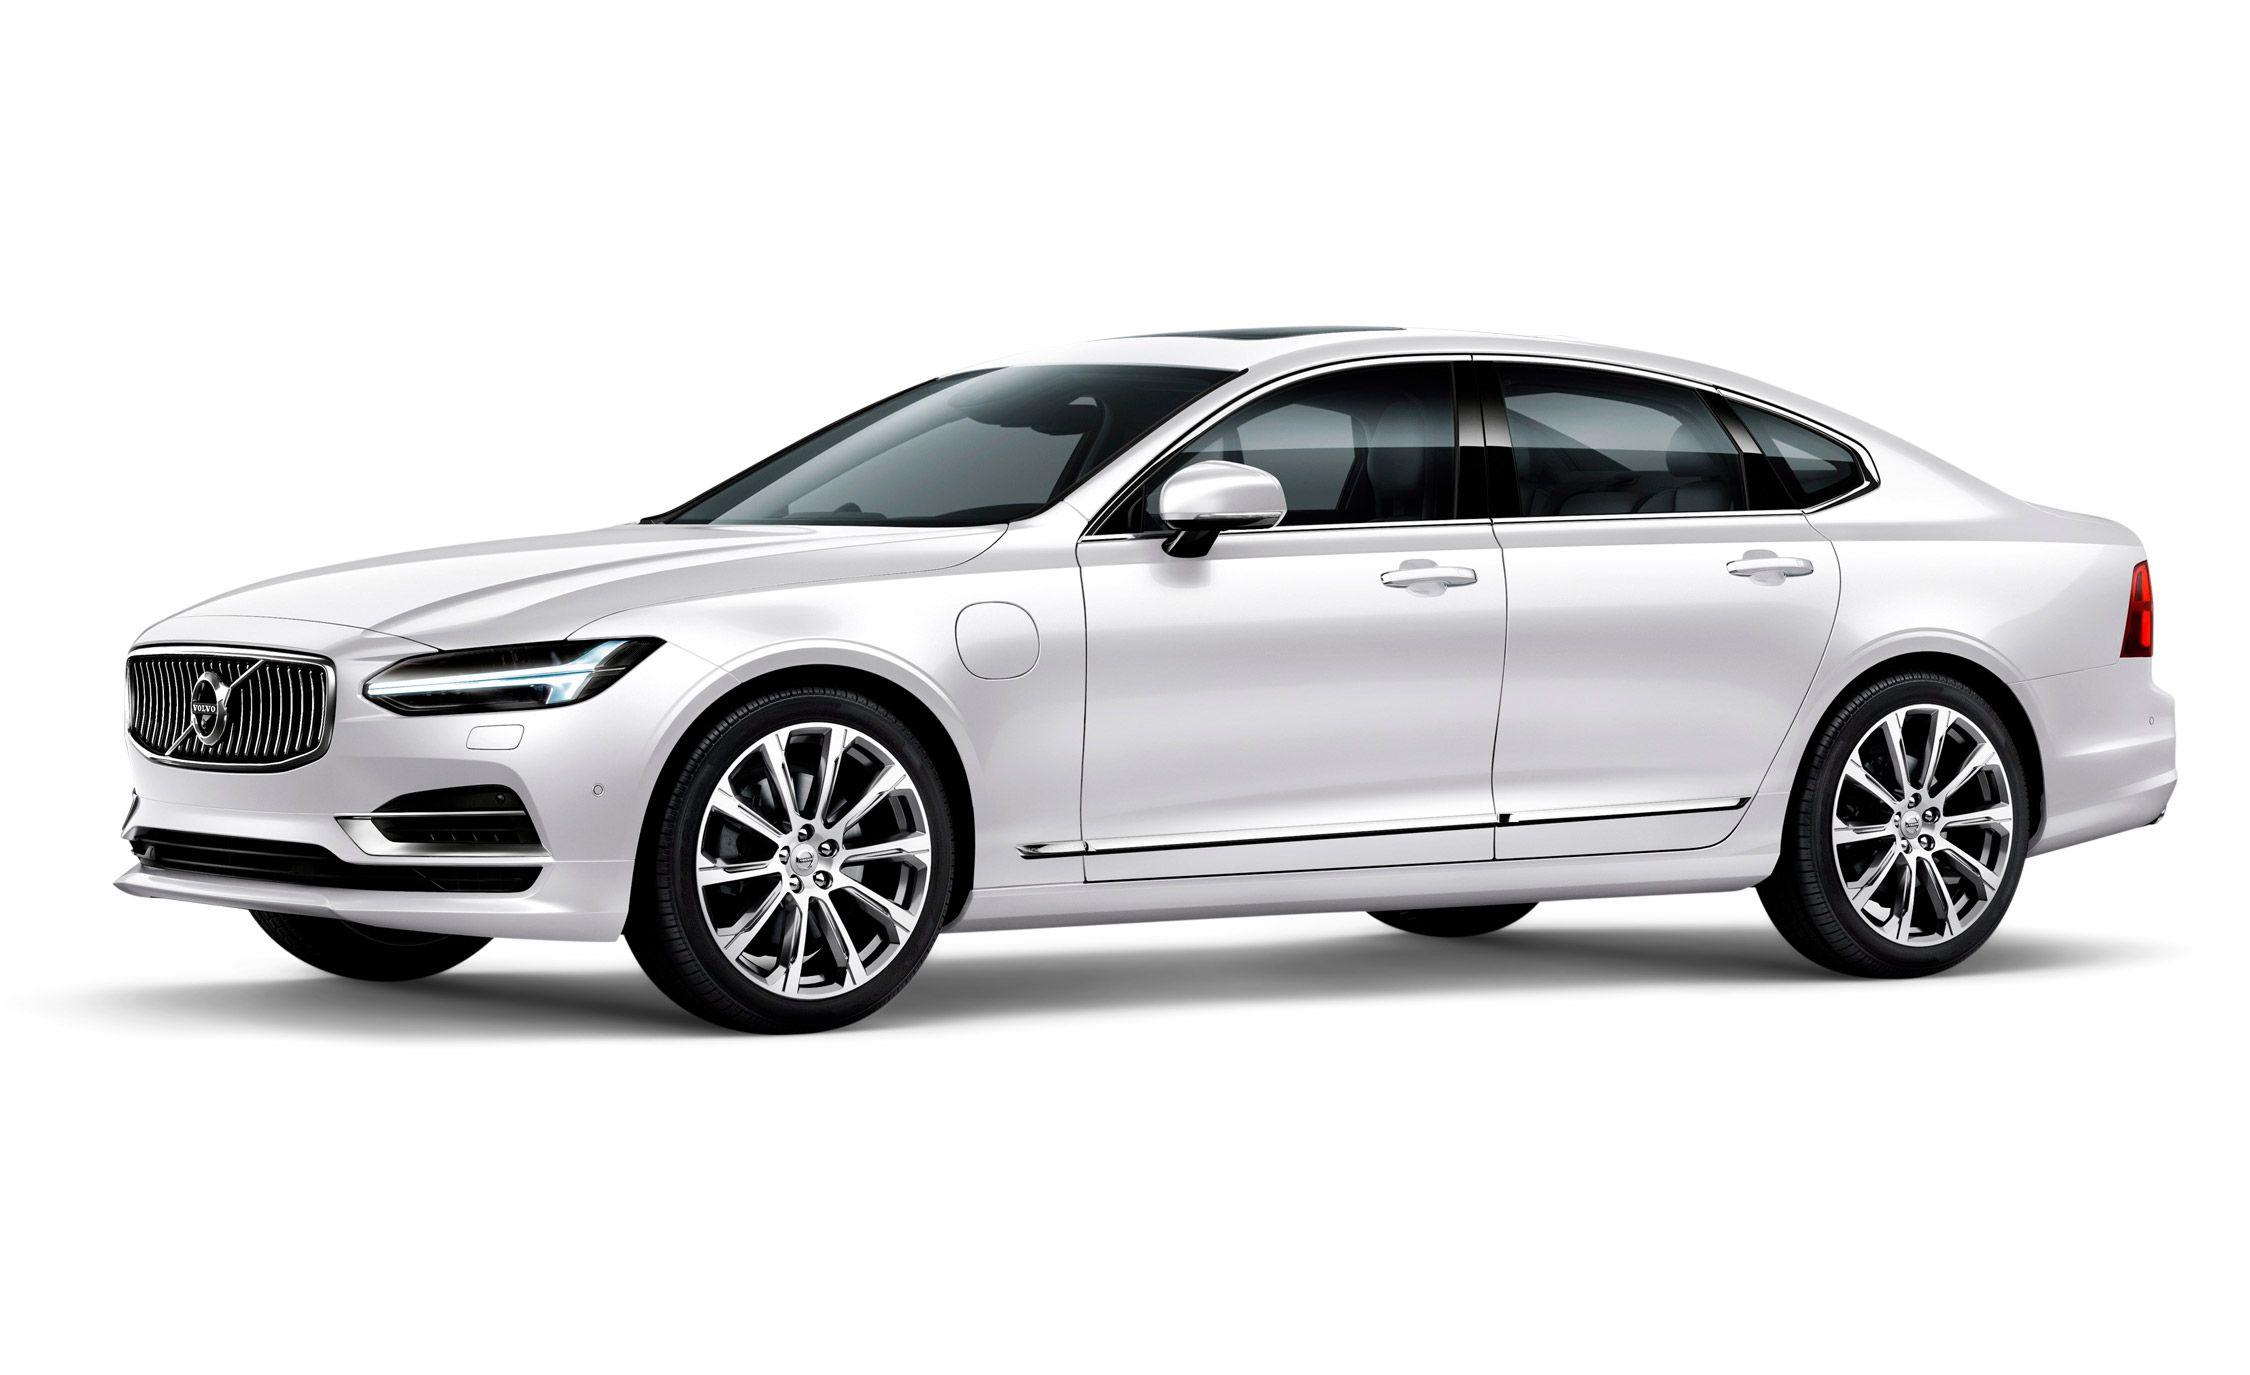 Audi a6 hybrid used car 16